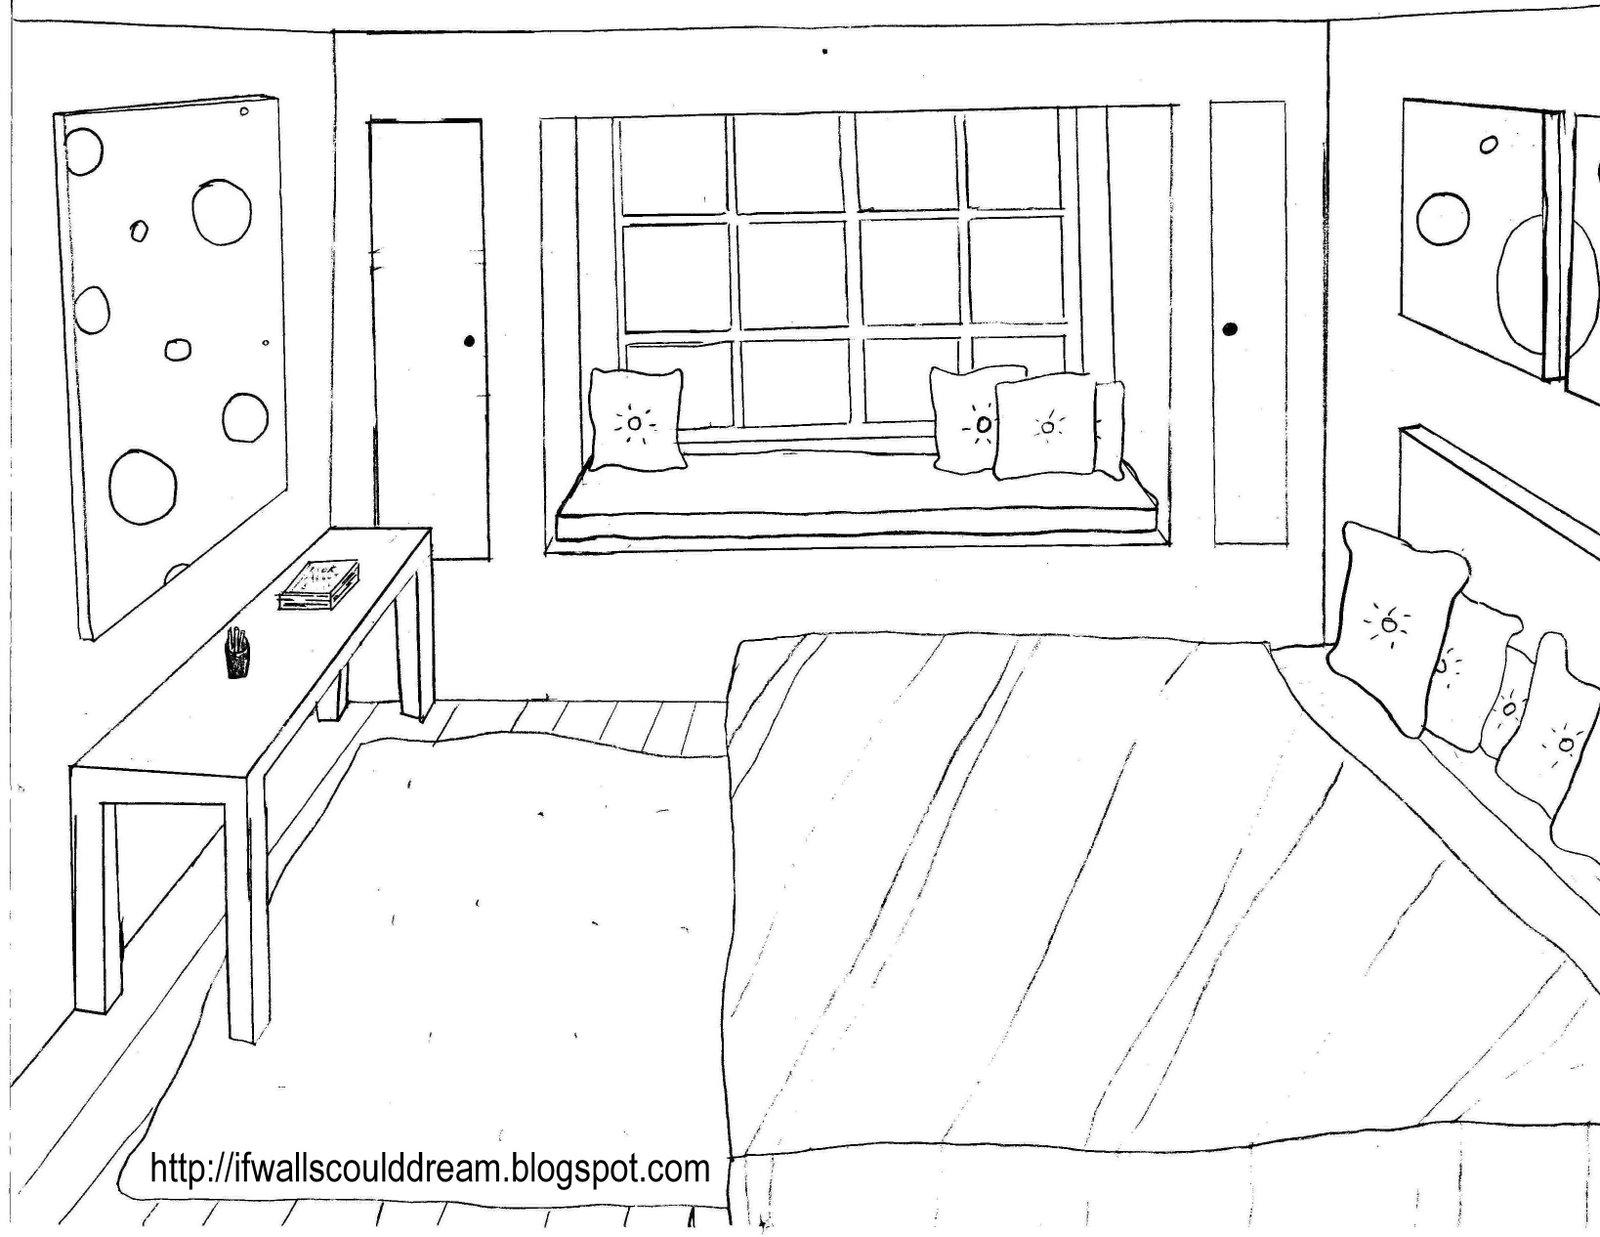 3d Bedroom Sketch At Paintingvalley